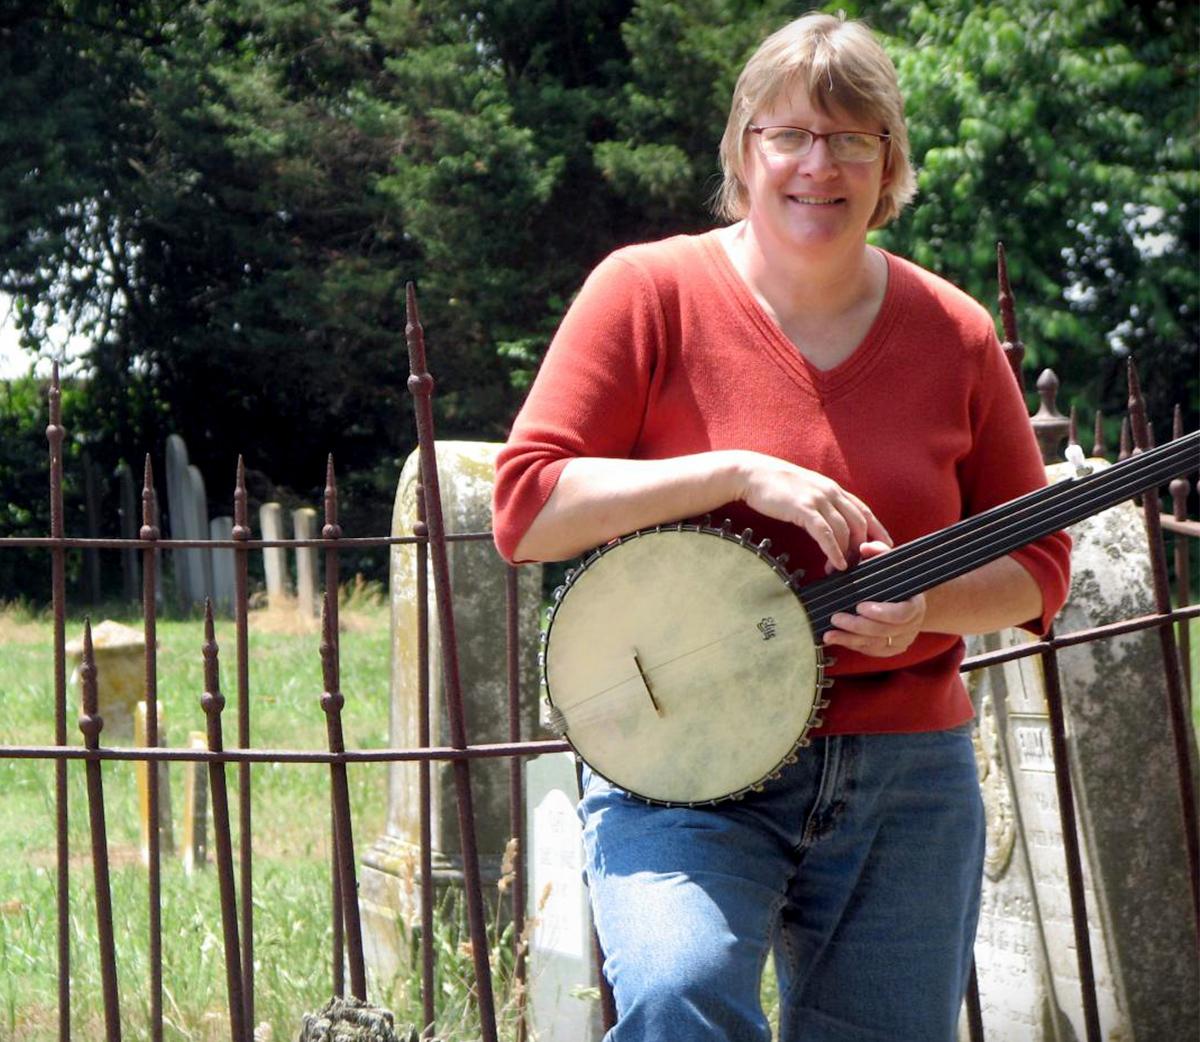 Caption: Chesapeake Folk Host Diana Wagner, Credit: Jason W. McKinzie